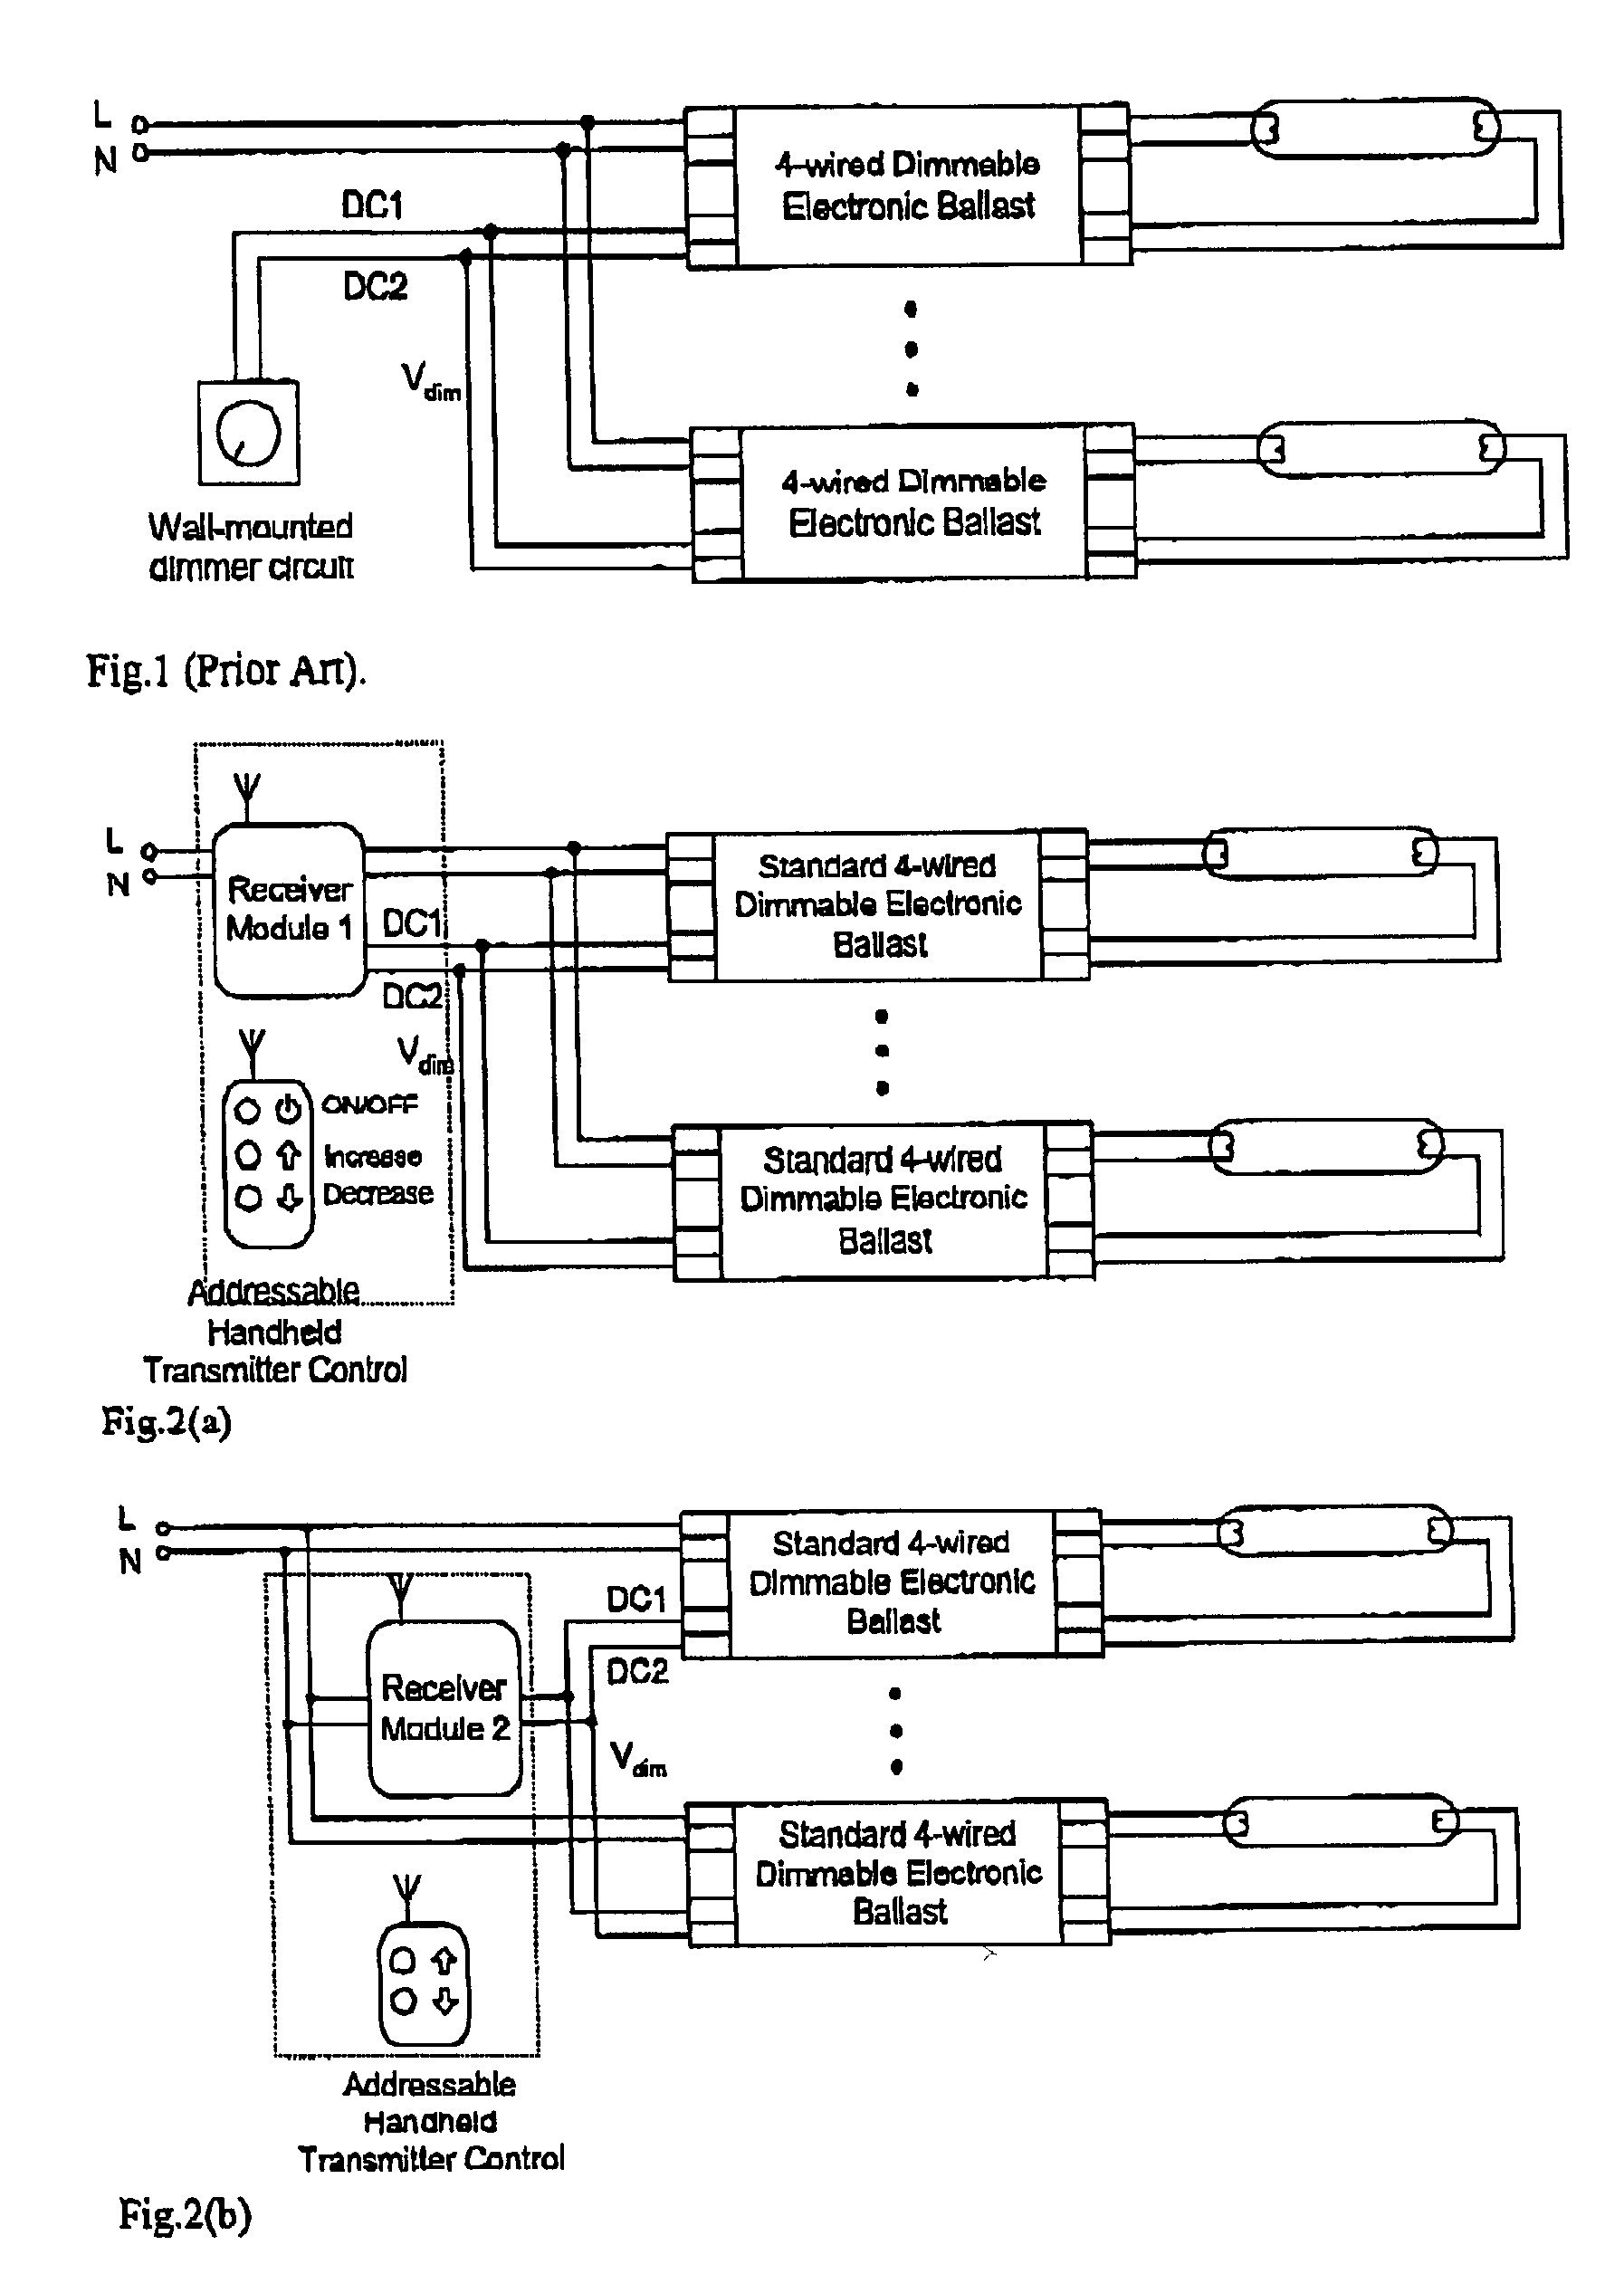 2 Bulb Ballast Wiring Diagram | Wiring Library - 2 Lamp T8 Ballast Wiring Diagram